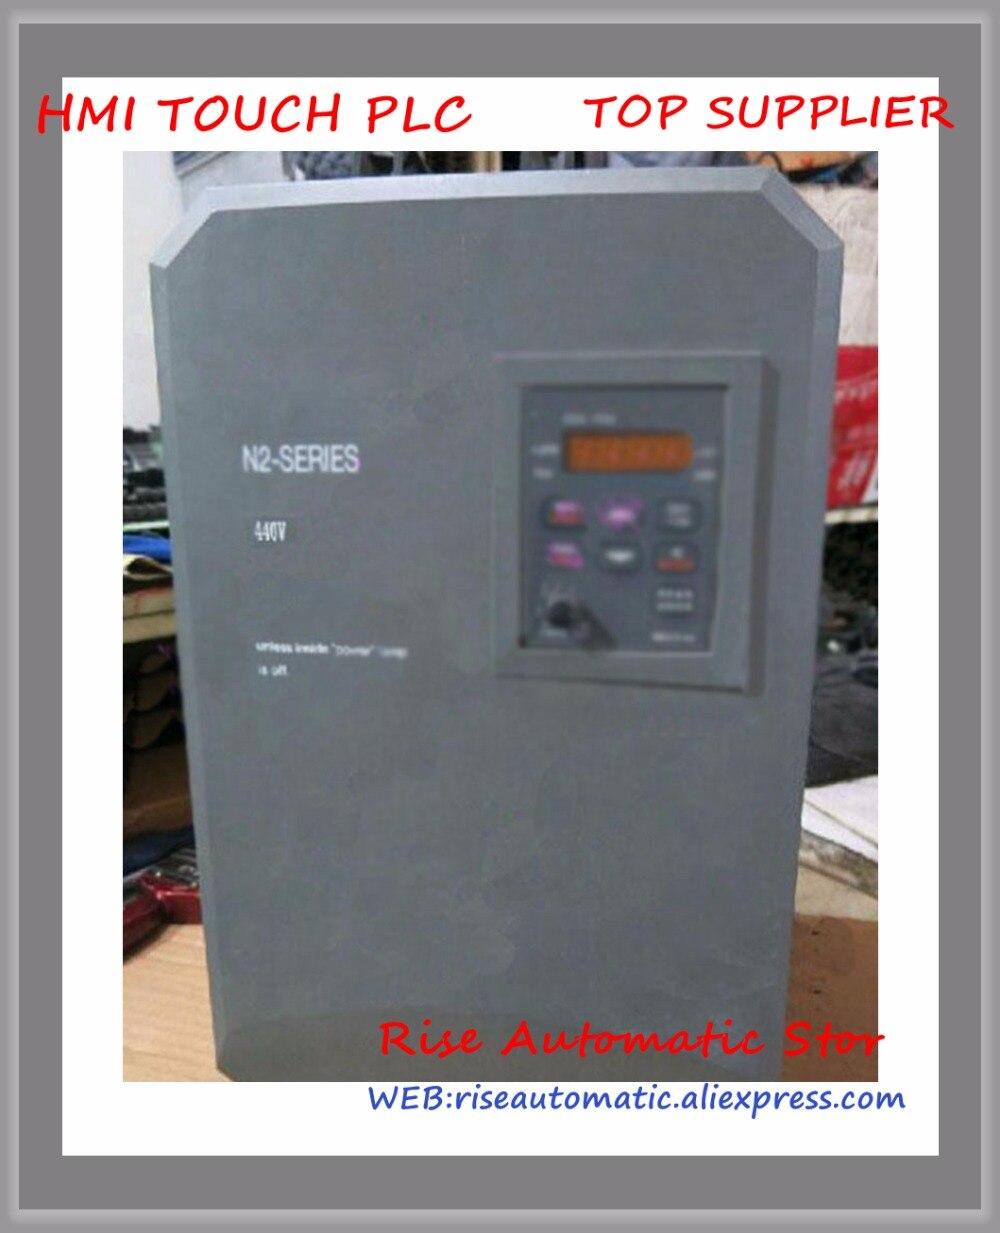 New Original Frequency Converter N2-430-H3 input 3Ph 380V output 3 Ph 380~480V 48A 22KW 30HP 0.1~400Hz input 3ph 380v output 3 ph frequency converter n2 n2 420 h3 series three phase general 380 480v 32a 15kw 20hp 0 1 400hz new